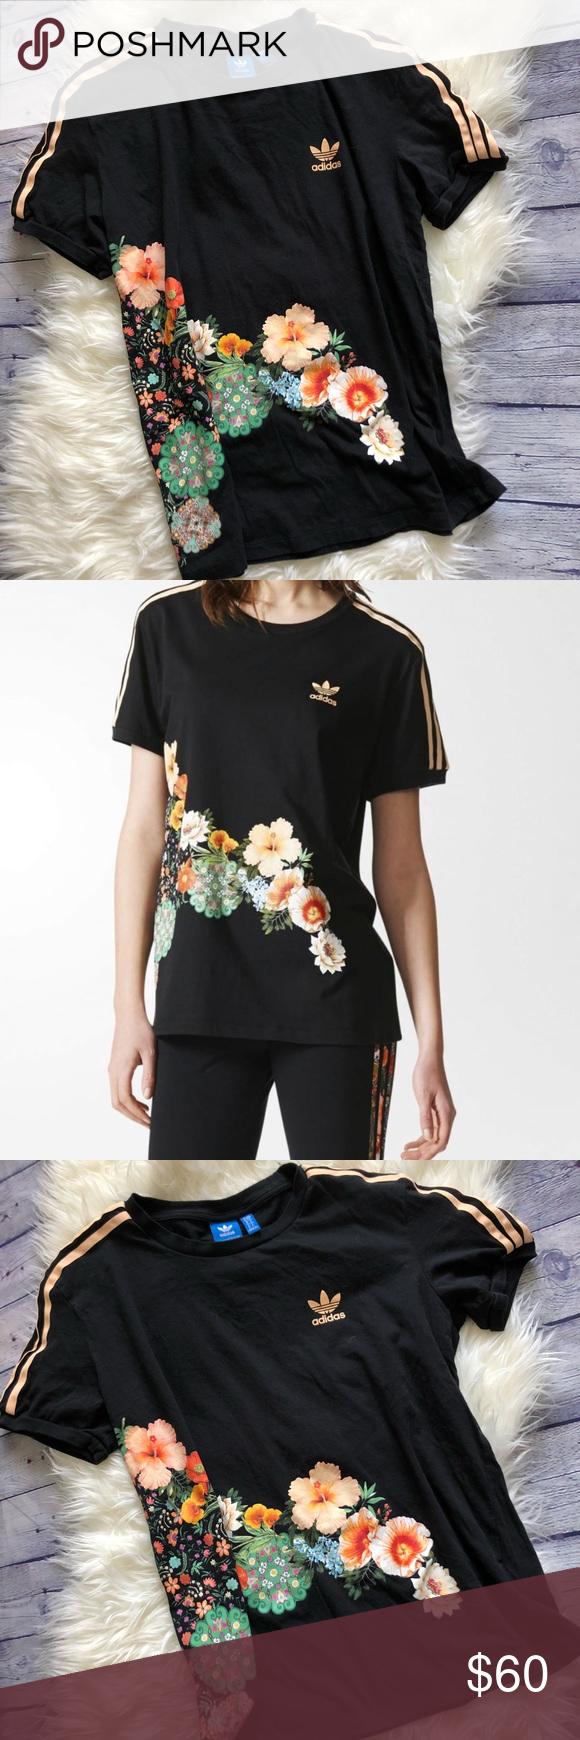 Adidas X Farm Rio Jardim T Shirt 910 condition. Size S